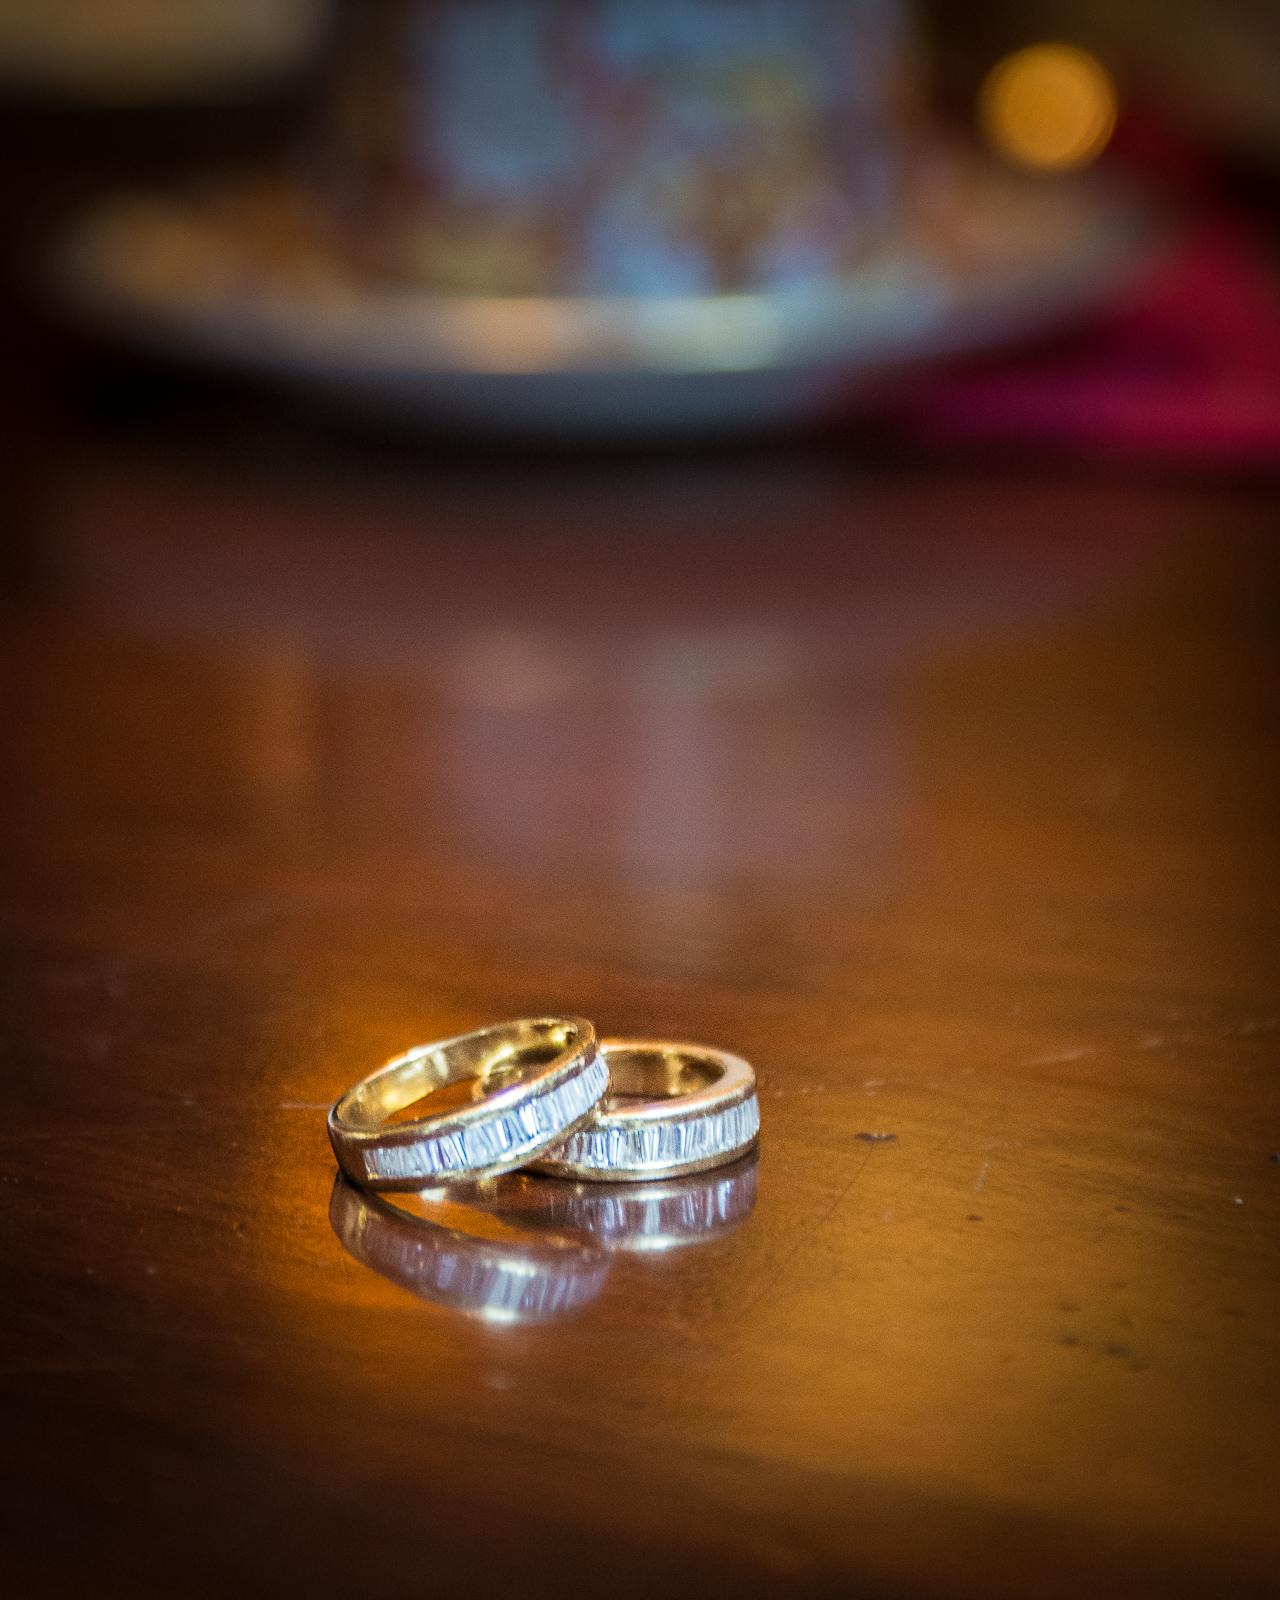 Michael-Napier-Weddings-Ludwig-Guilbeau Wedding-20 (4).jpg